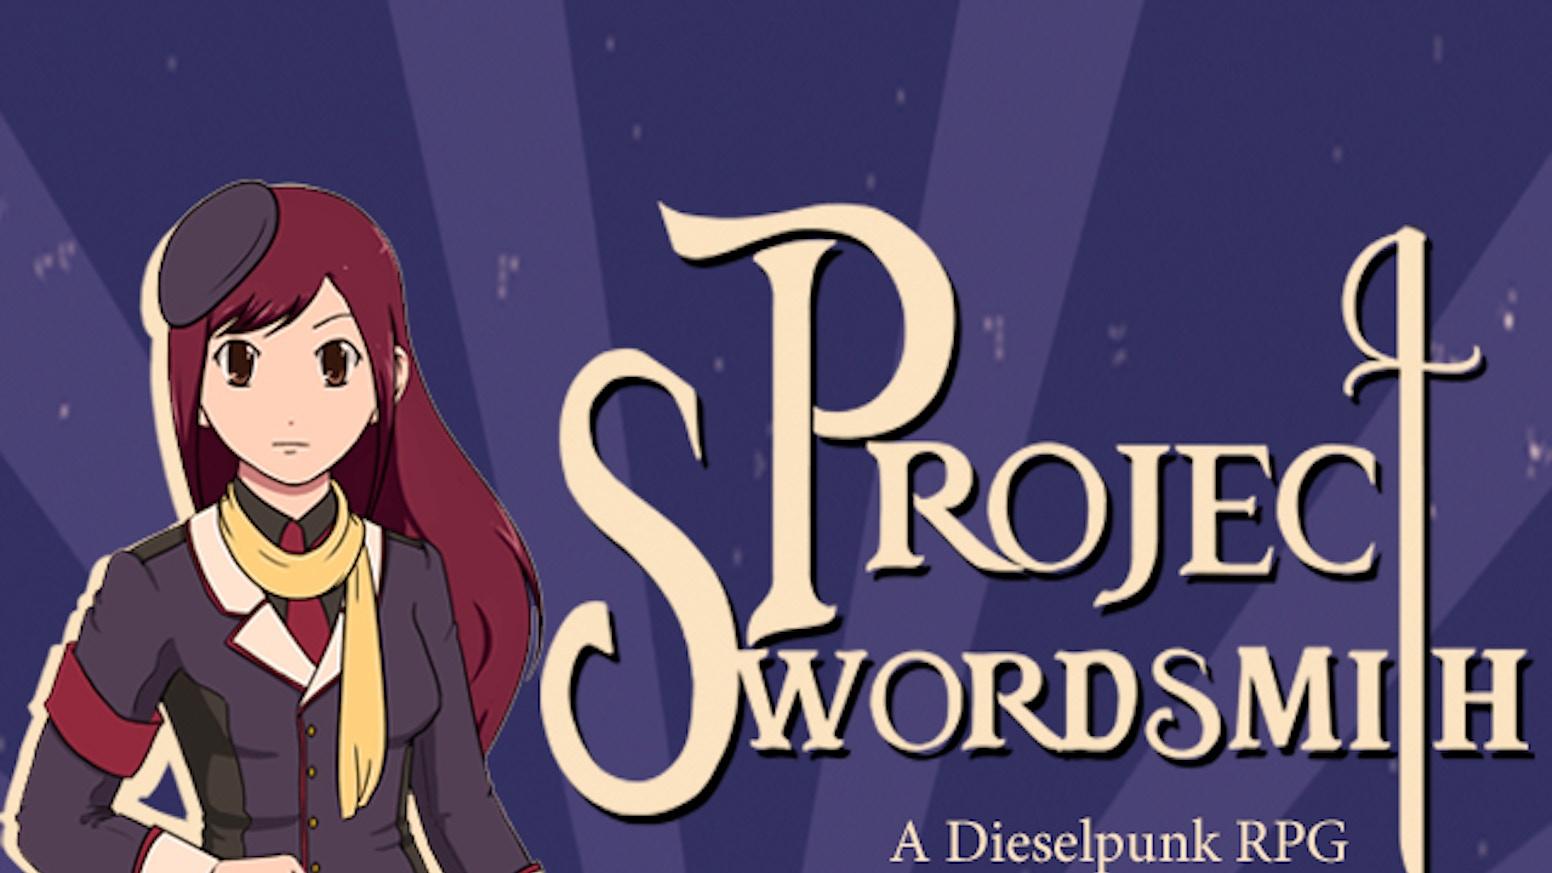 4db54dd37178 Project Swordsmith by DuCiel Spitzfaden — Kickstarter